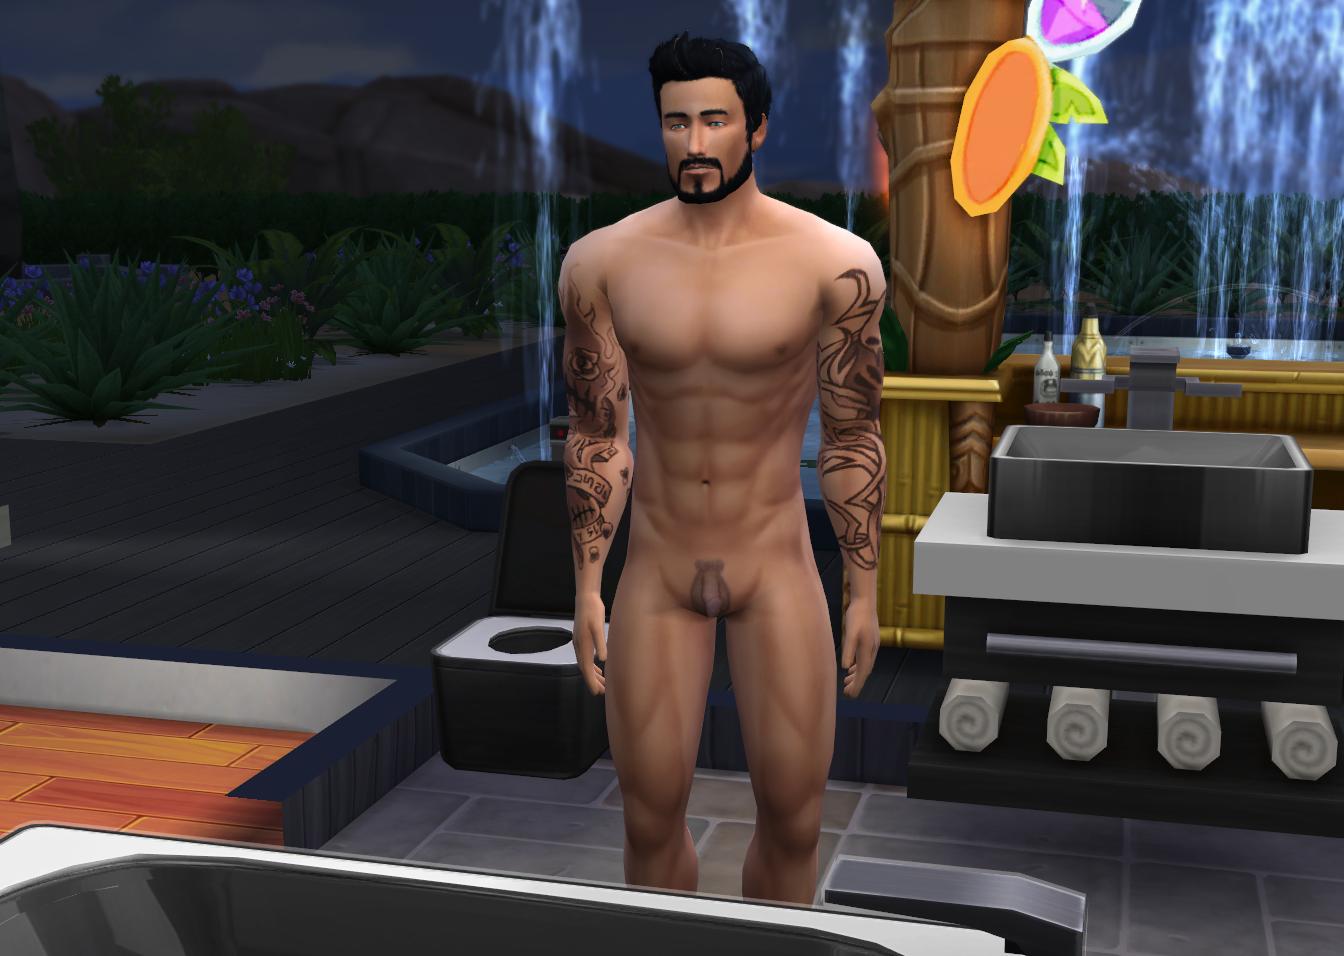 Porn sims super nude